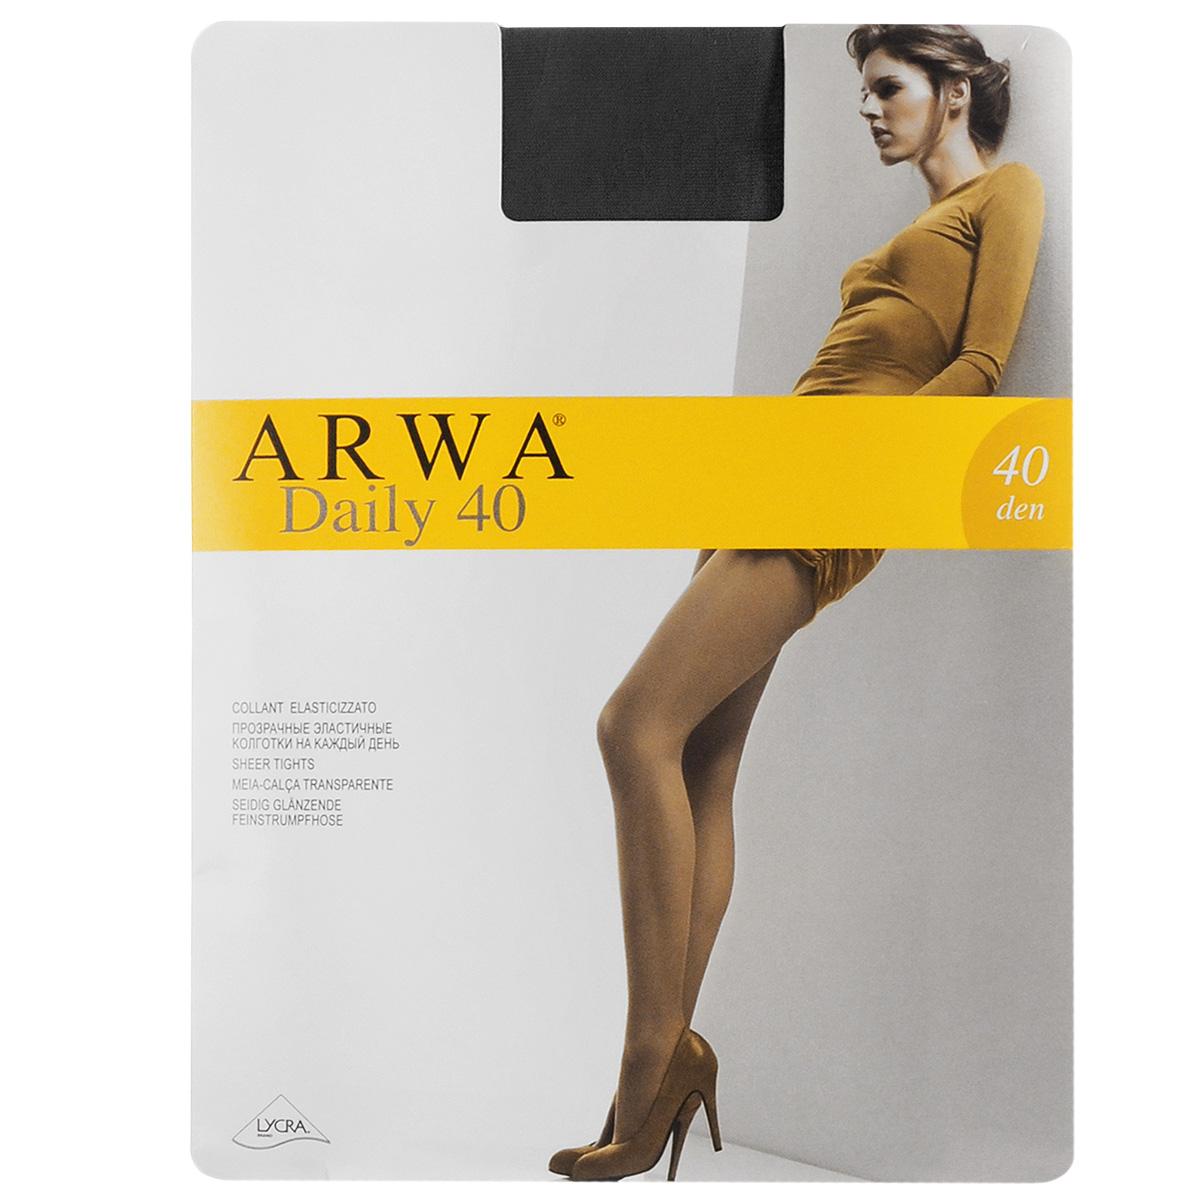 Arwa Колготки женские Daily 40